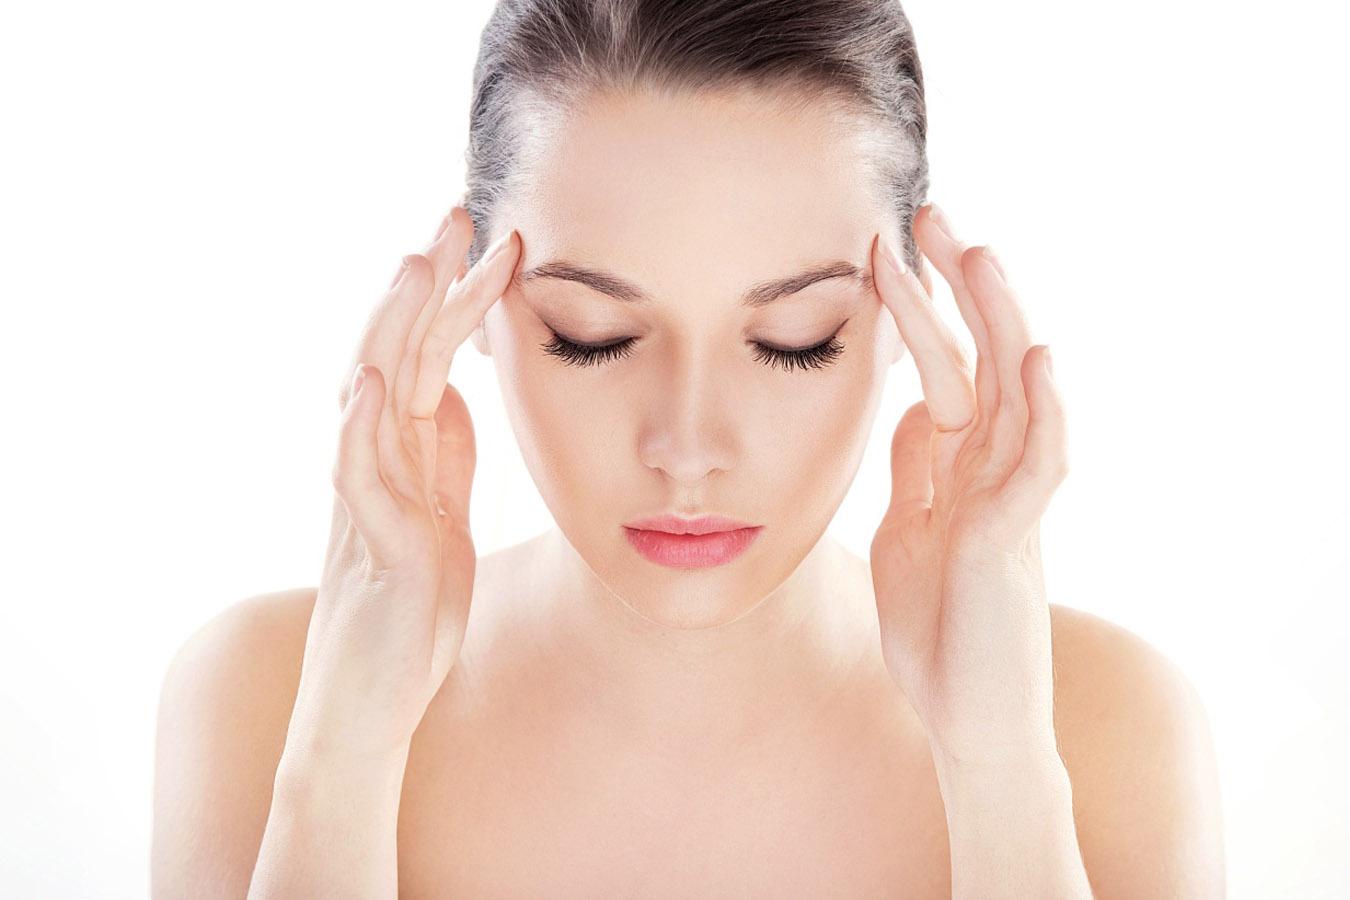 Cefalea tensiva: sintomi, rimedi naturali ed esercizi